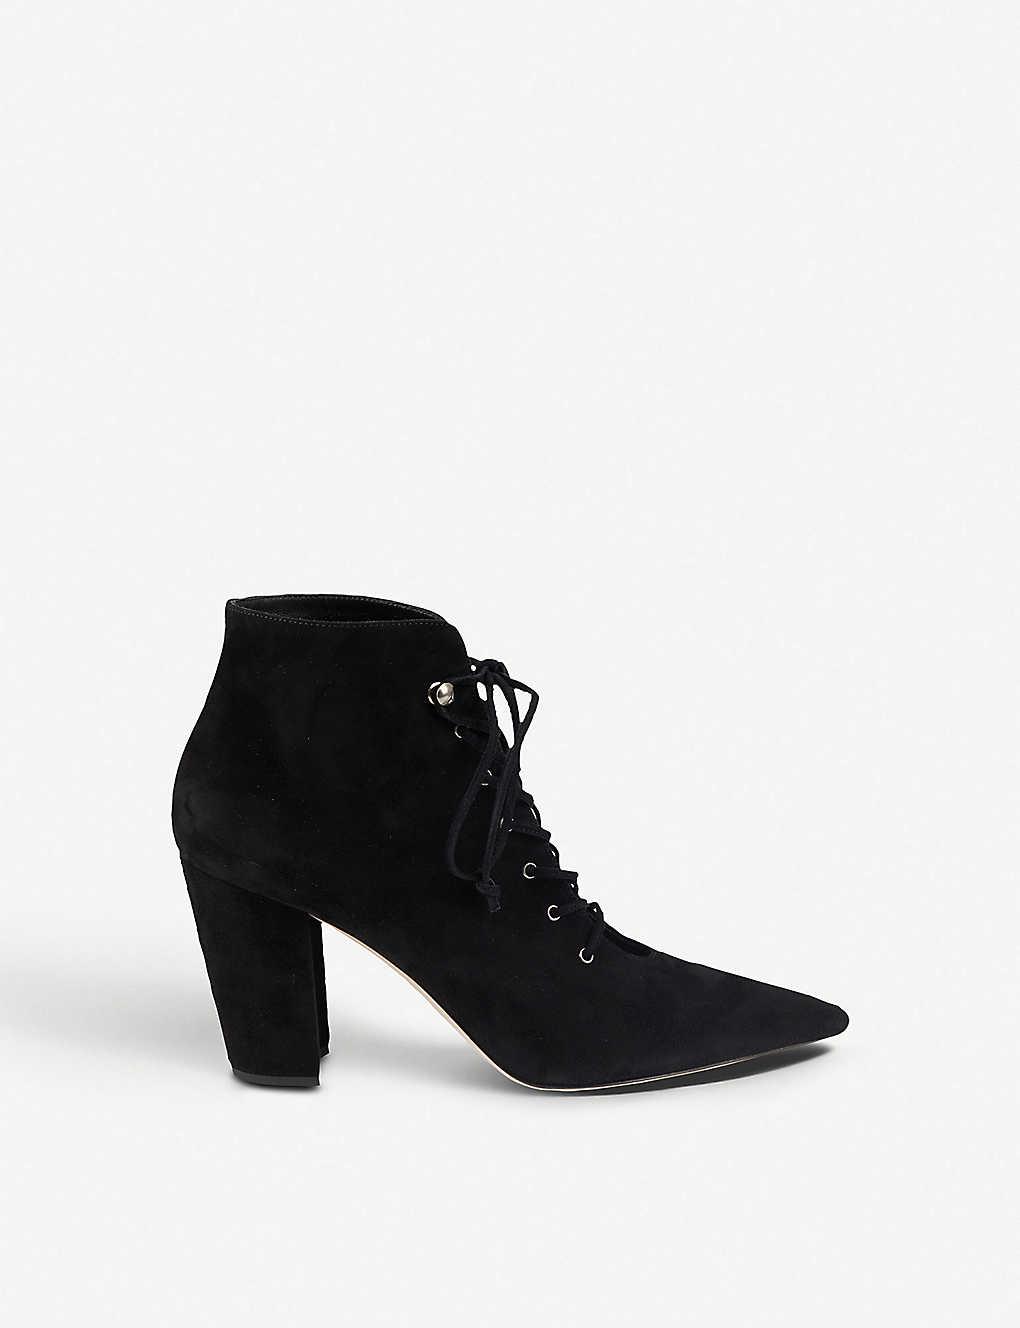 59a0f23f1a1a MIU MIU - Suede lace-up ankle boots